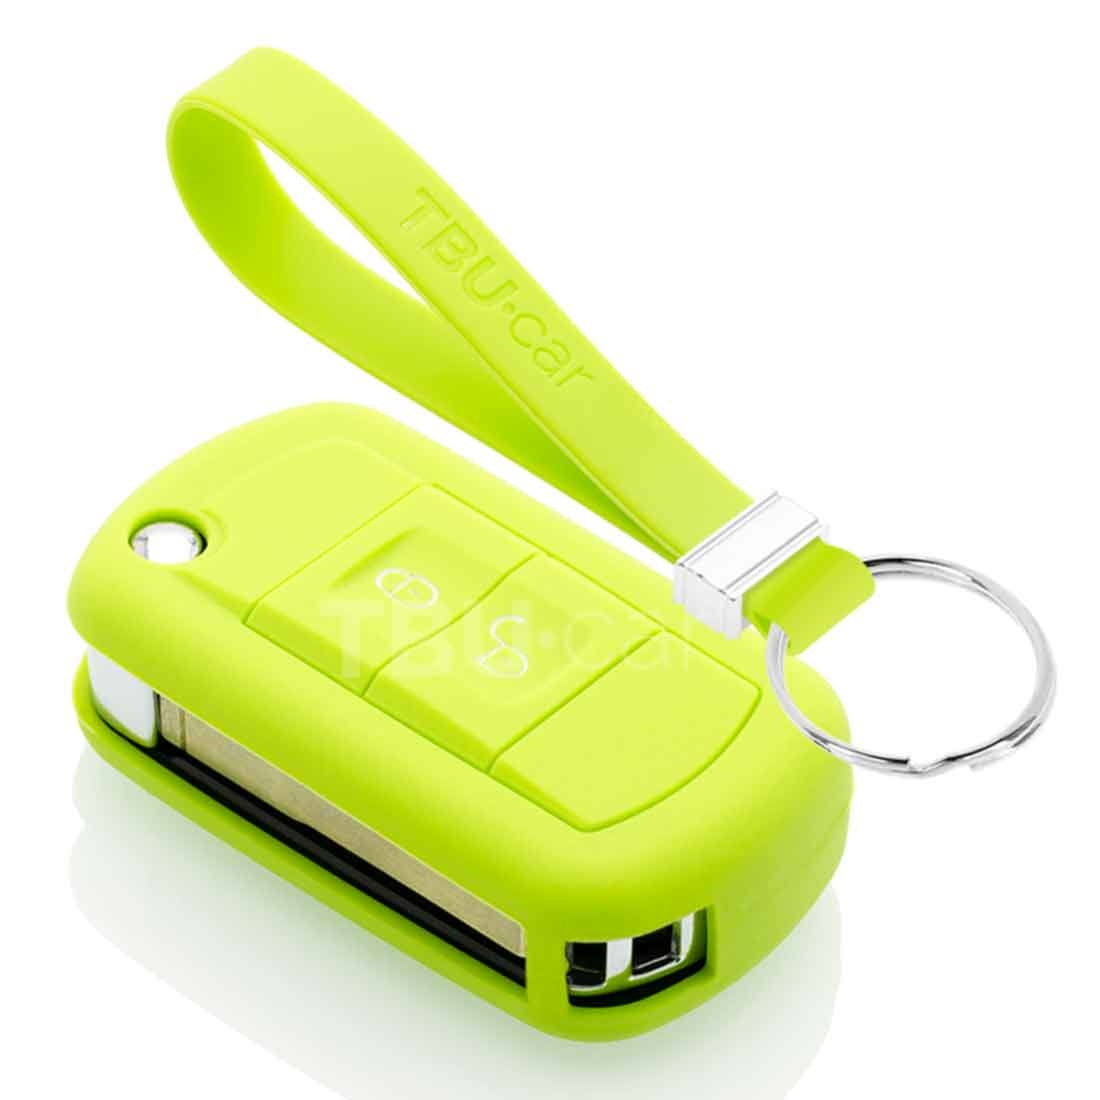 TBU car TBU car Autoschlüssel Hülle kompatibel mit Land Rover 2 Tasten - Schutzhülle aus Silikon - Auto Schlüsselhülle Cover in Hellgrün